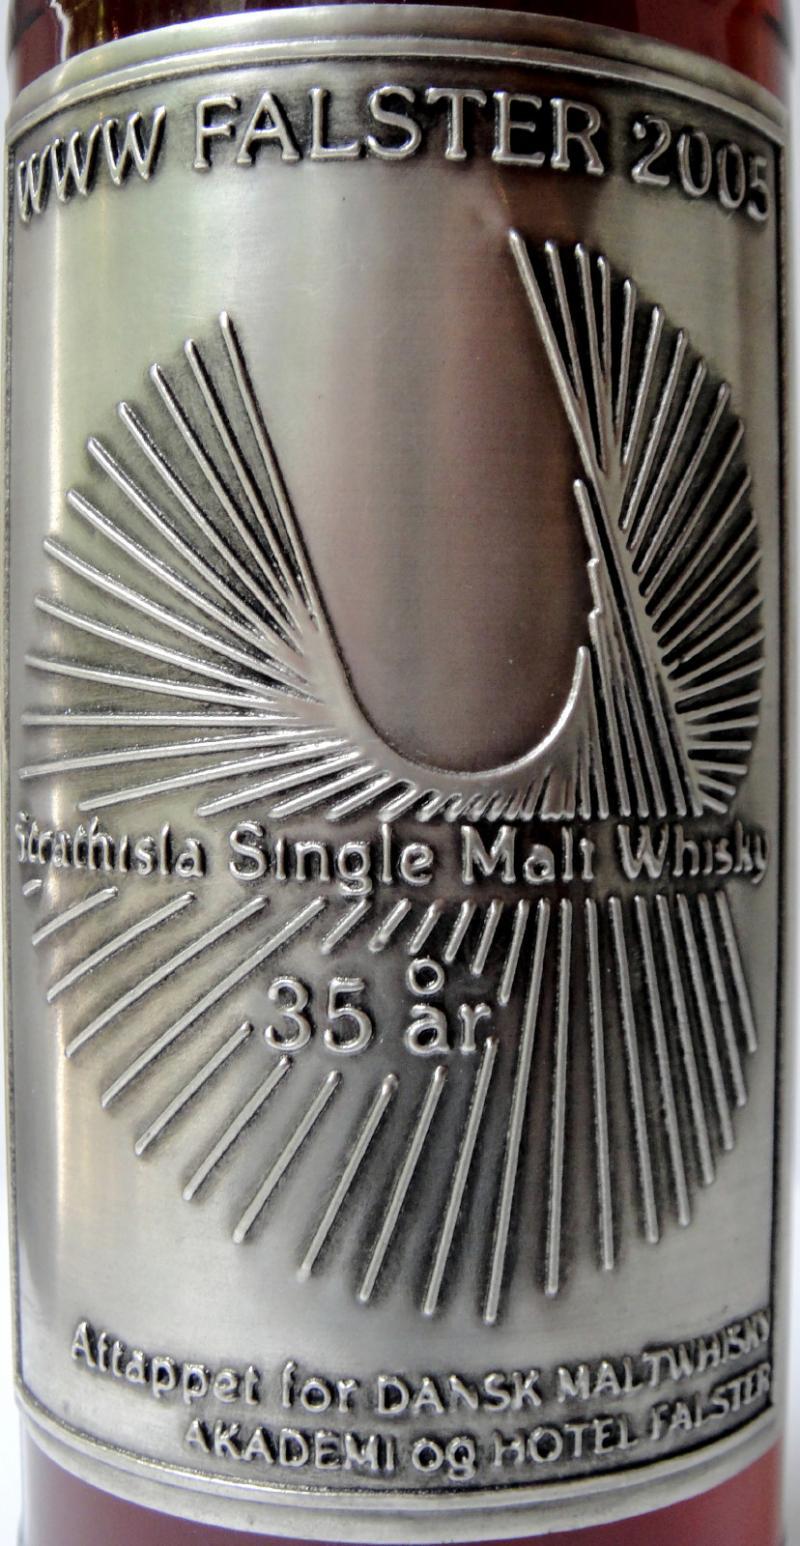 Strathisla 1969 DMA